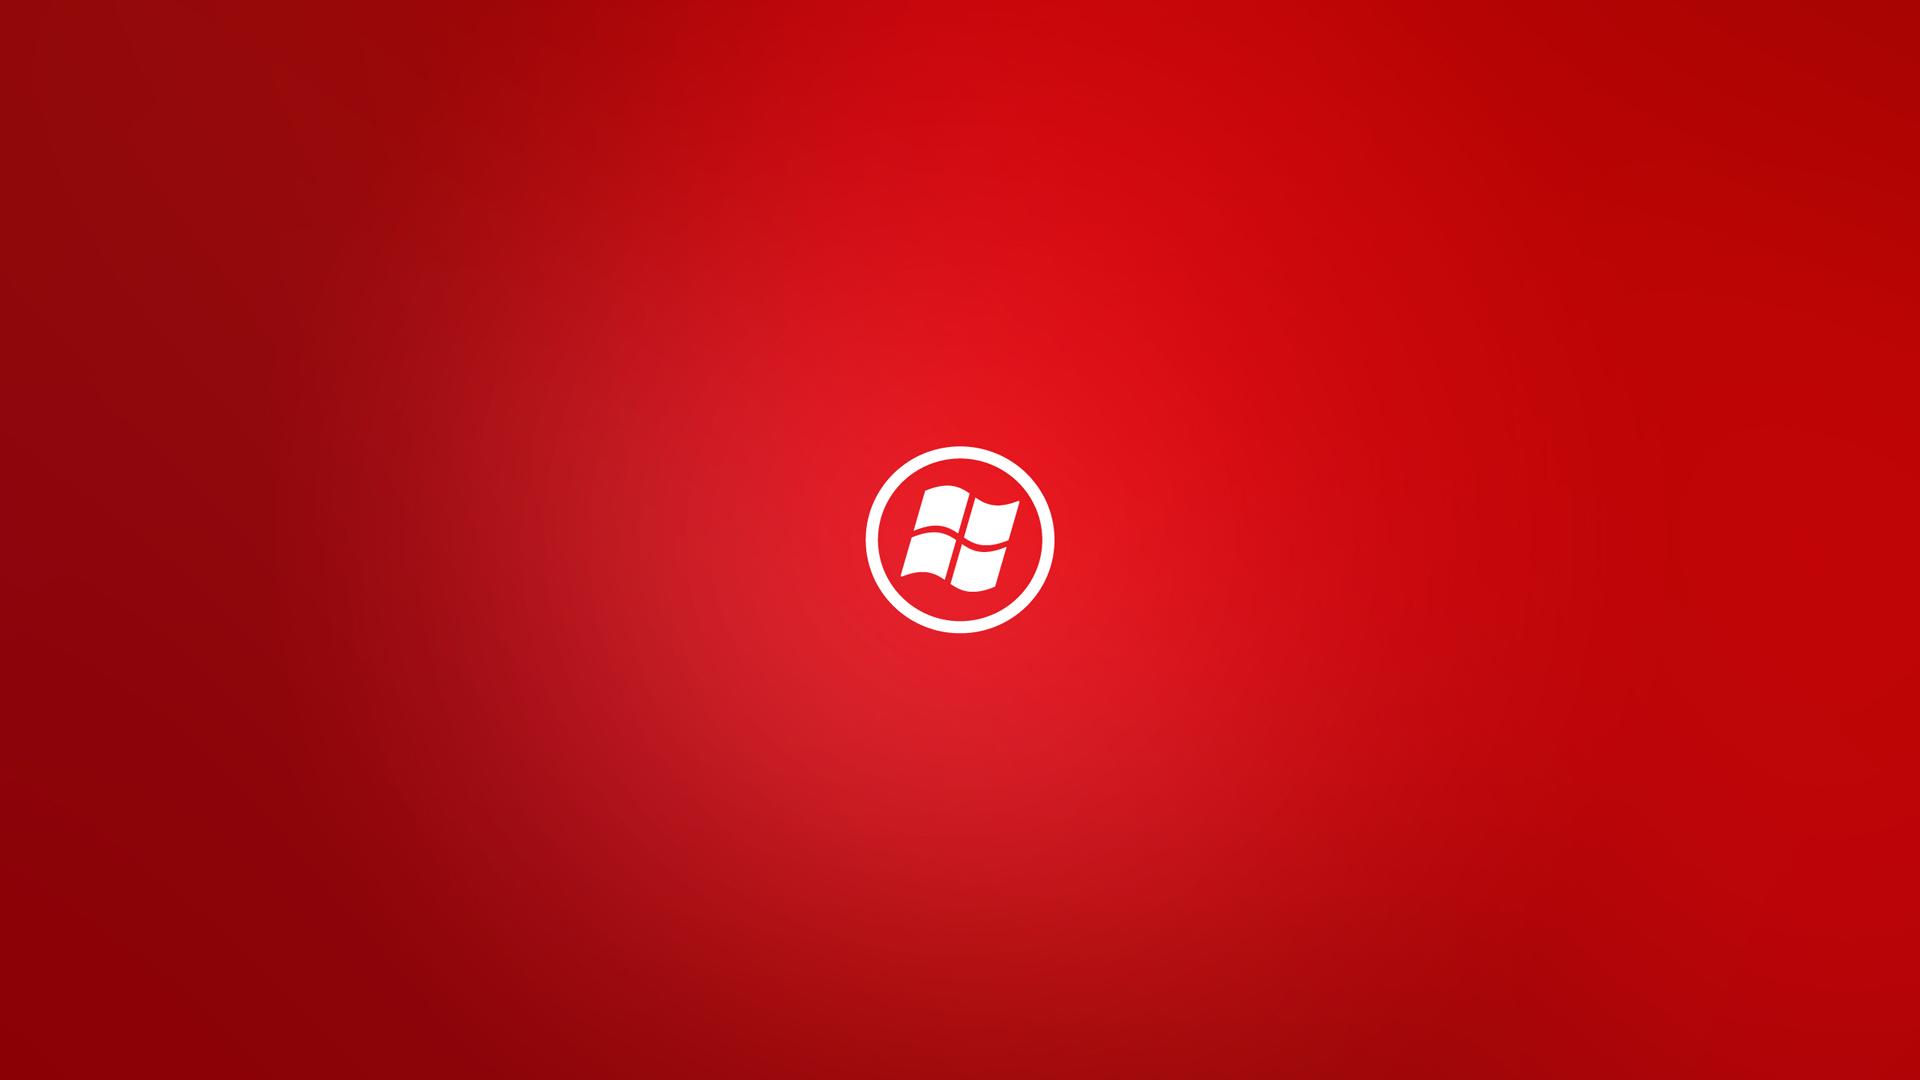 Windows 8 Pro Wallpaper Hd